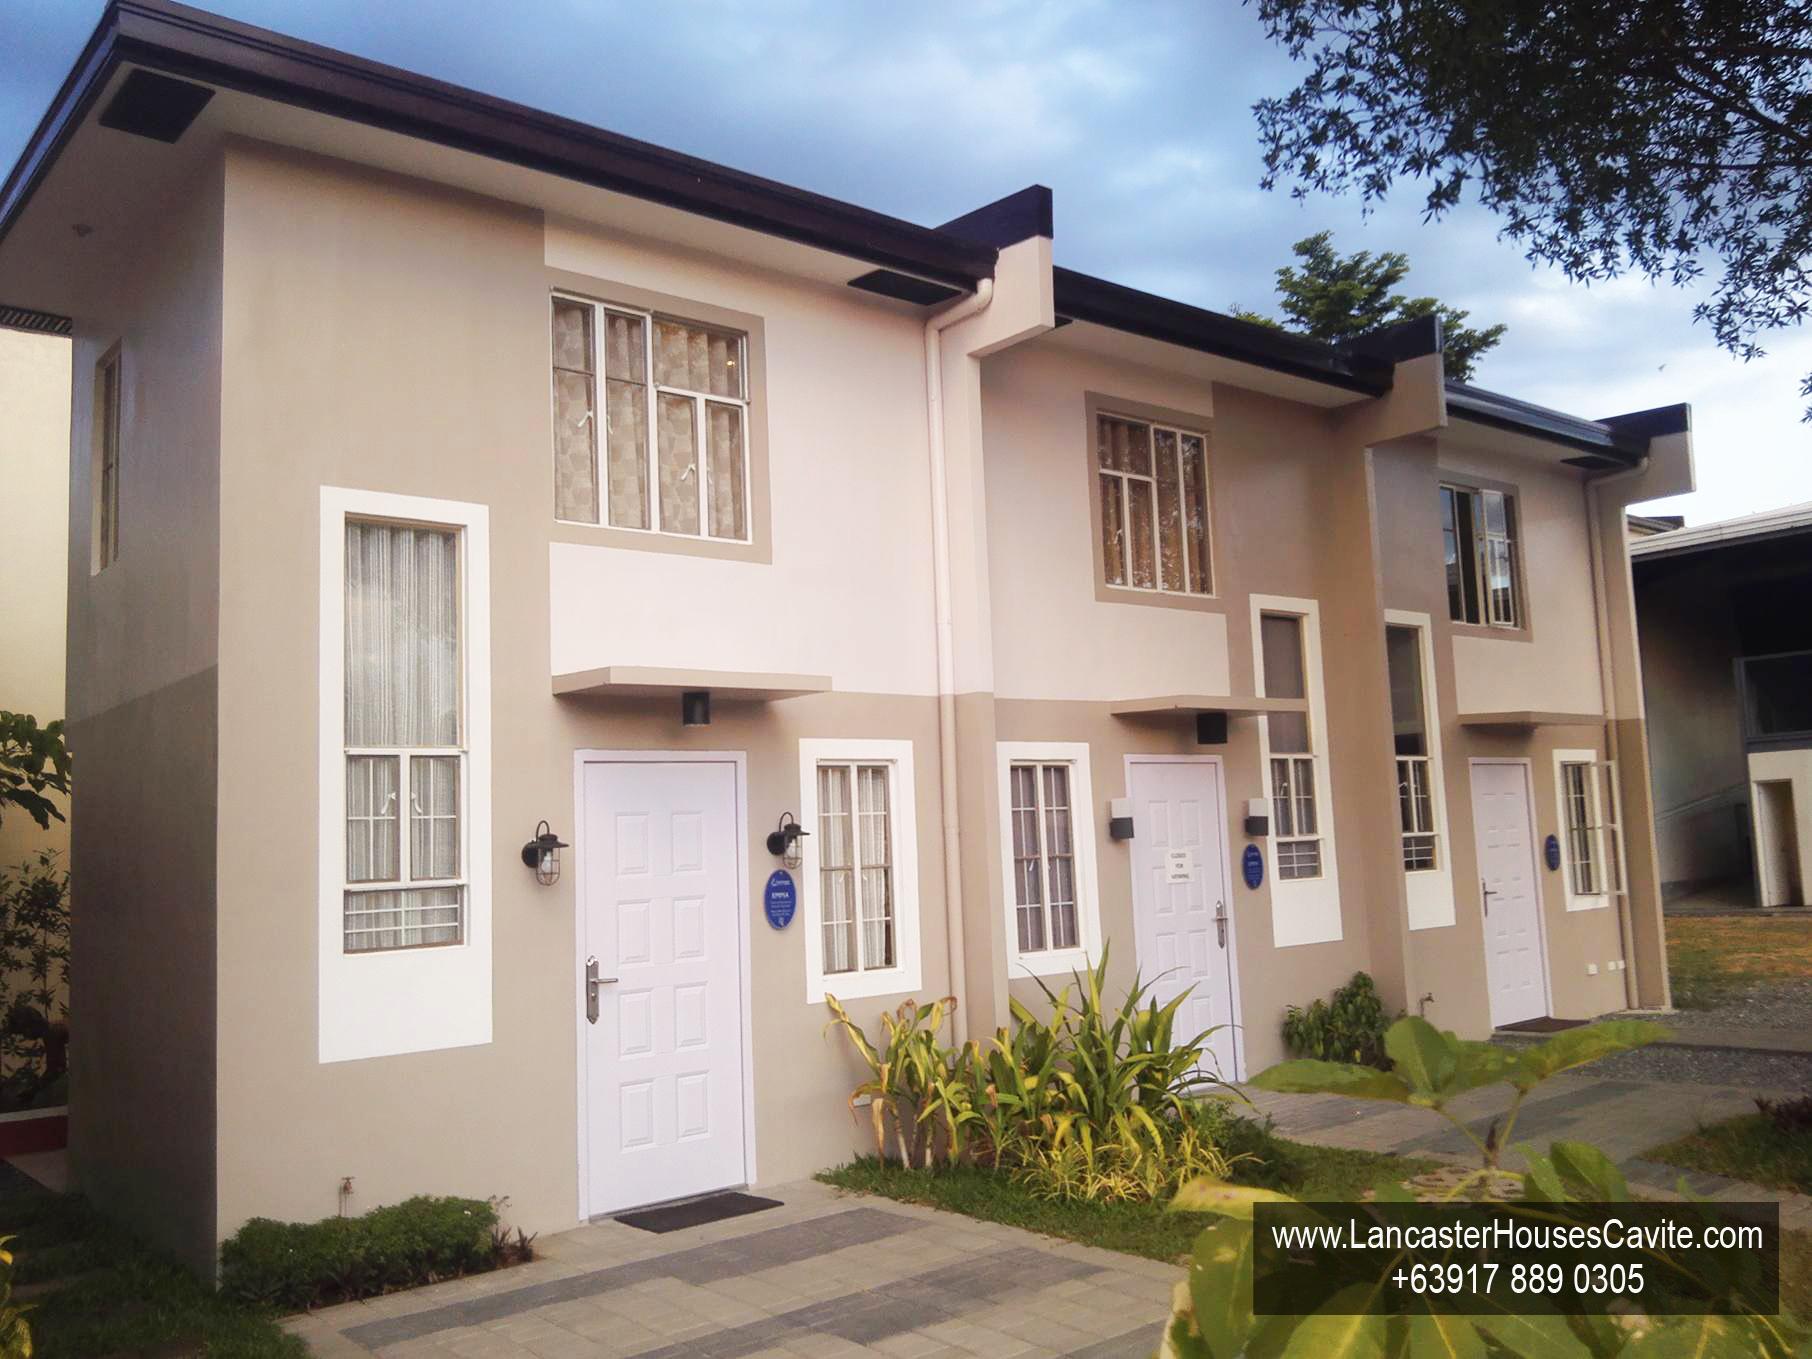 Emma House Model Lancaster Houses For Sale In Cavite Lancaster Houses Cavite